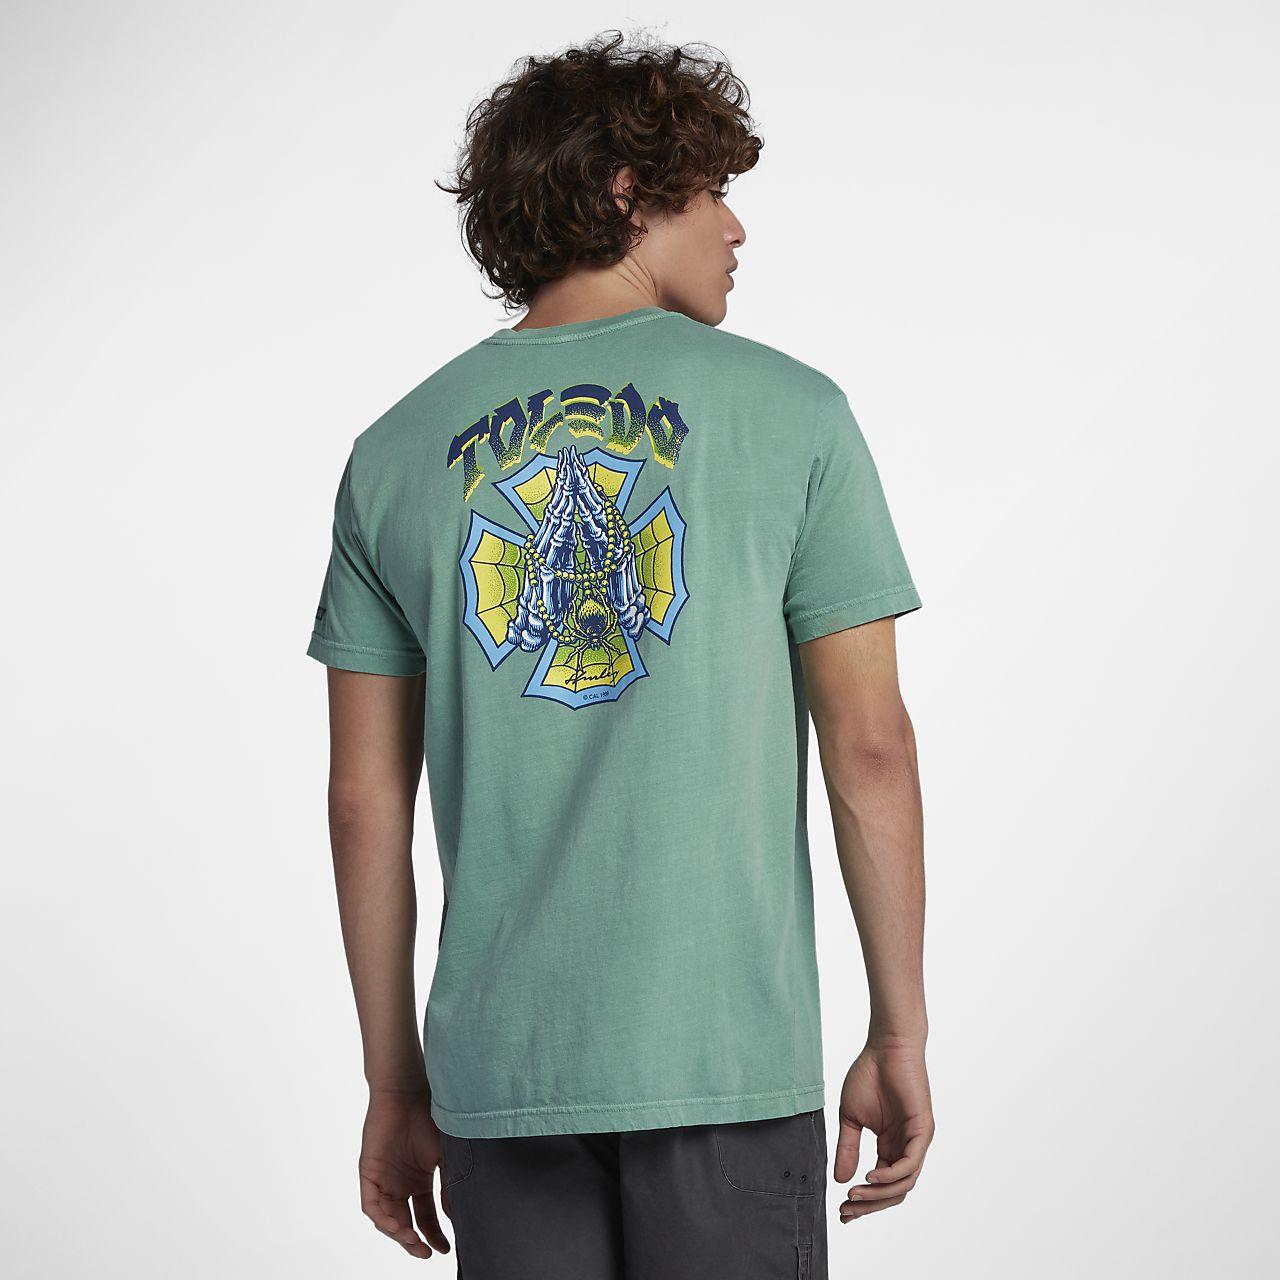 Pánské tričko Hurley Team Toledo. Nike.com CZ c6f55e69db